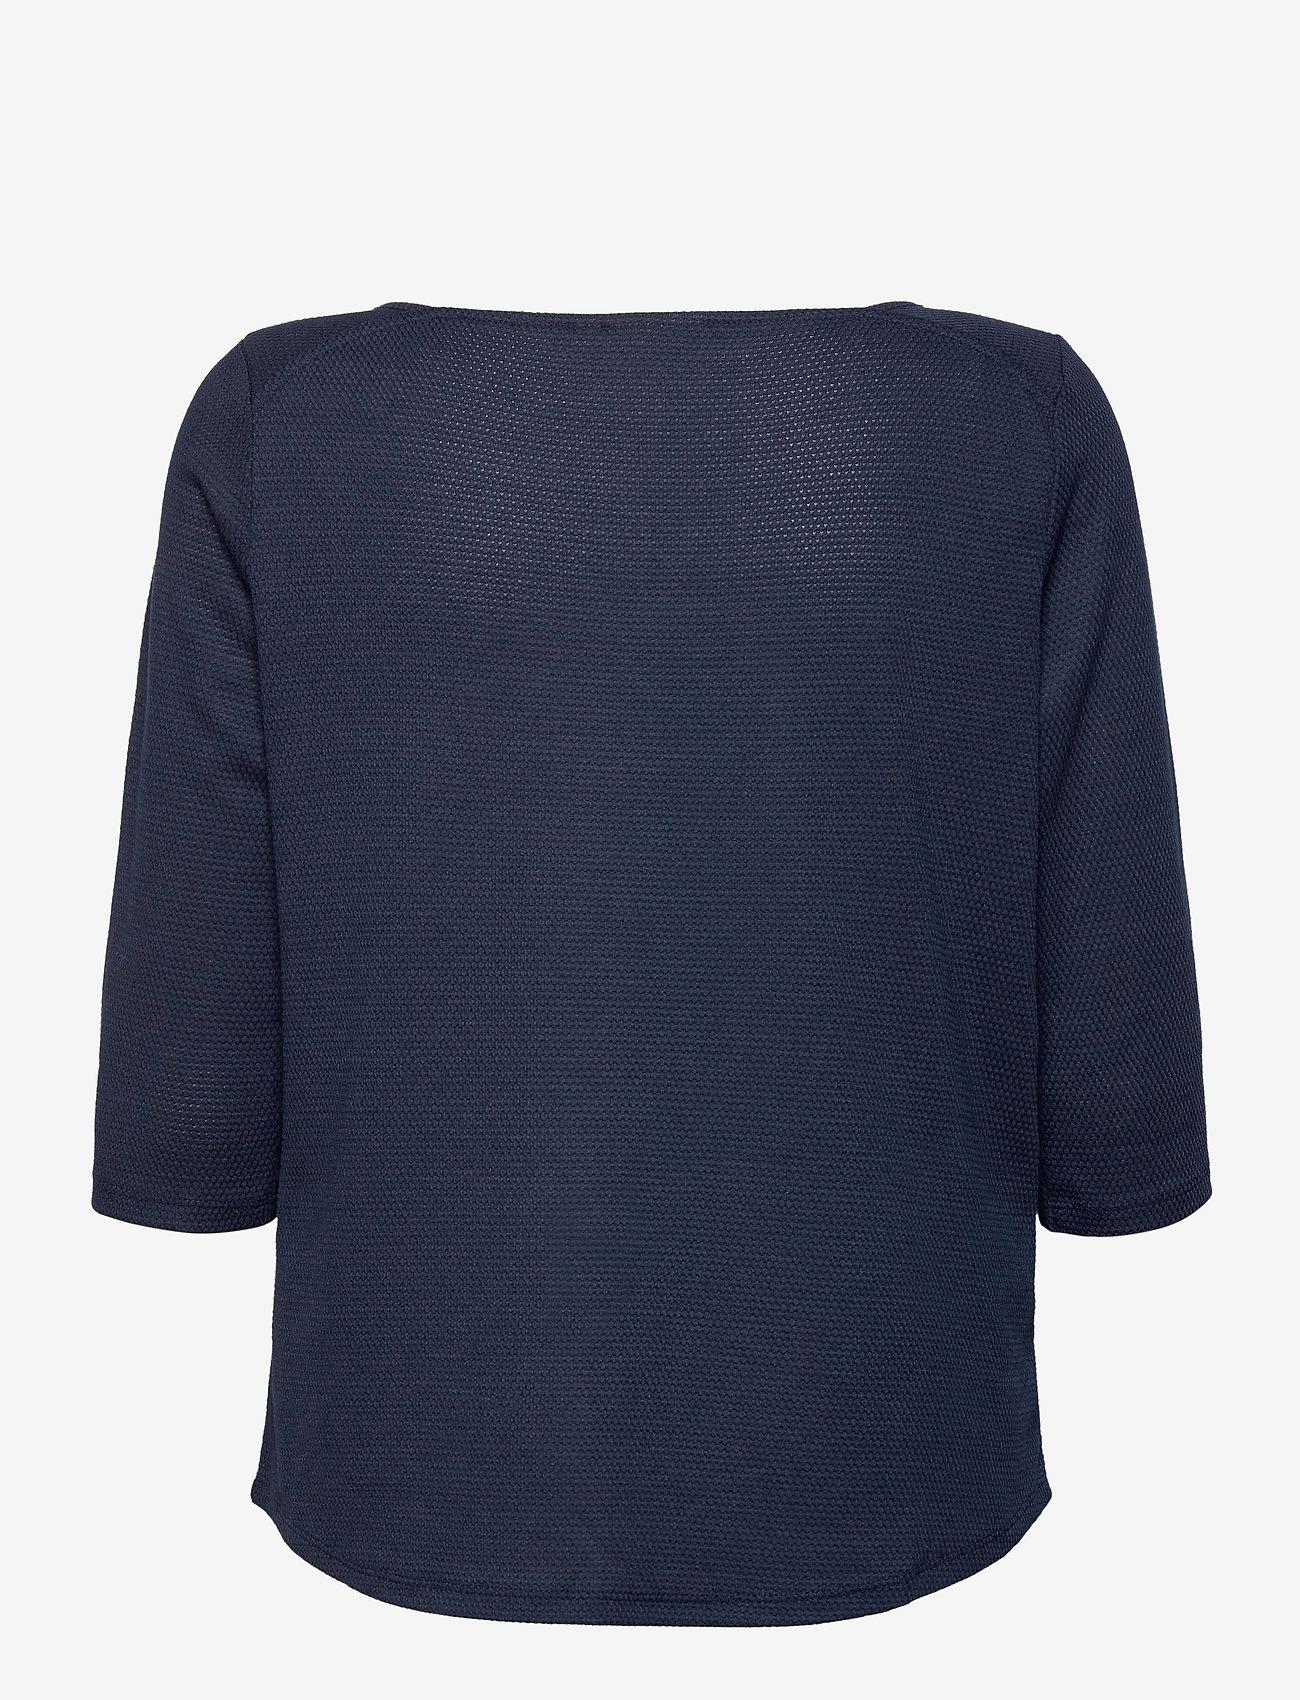 Fransa - FRPEJACQ 1 T-shirt - pitkähihaiset t-paidat - navy blazer - 1